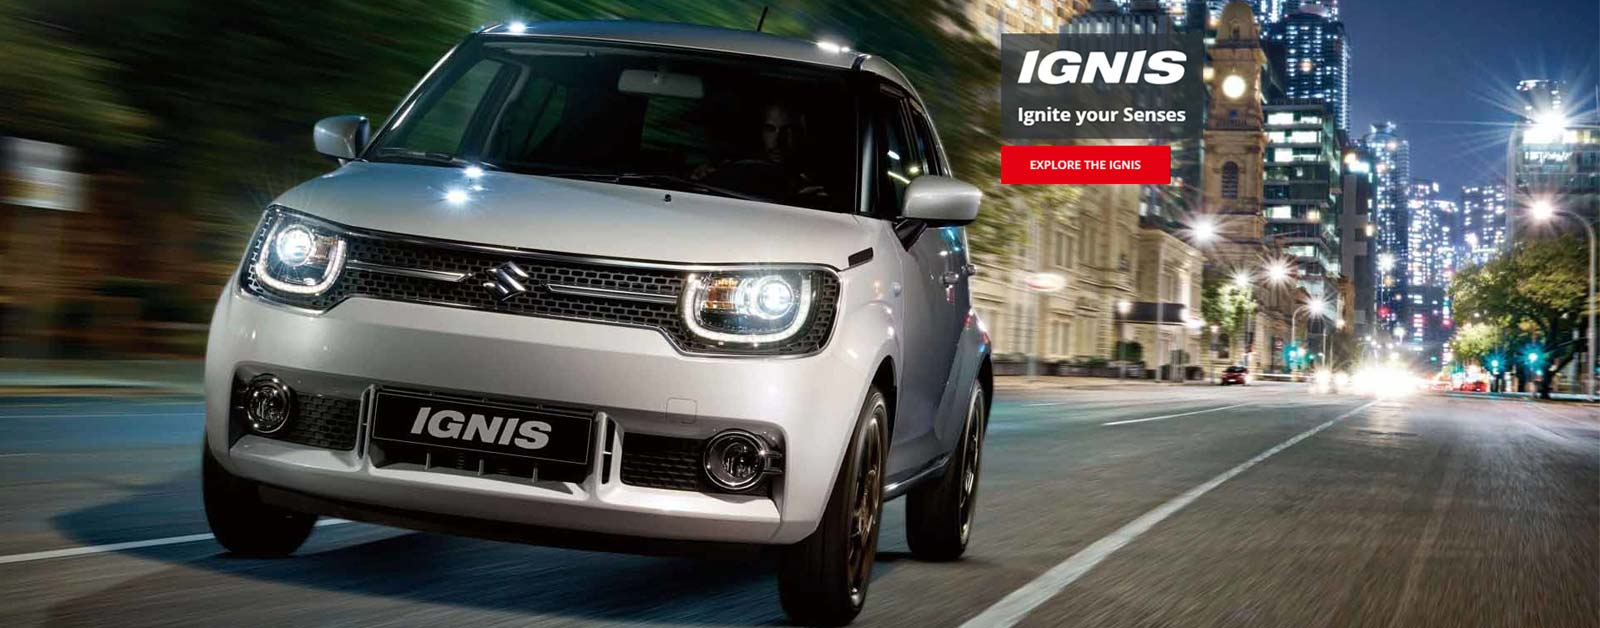 Explore the new Suzuki Ignis and ignite your senses at Nundah Suzuki Brisbane.